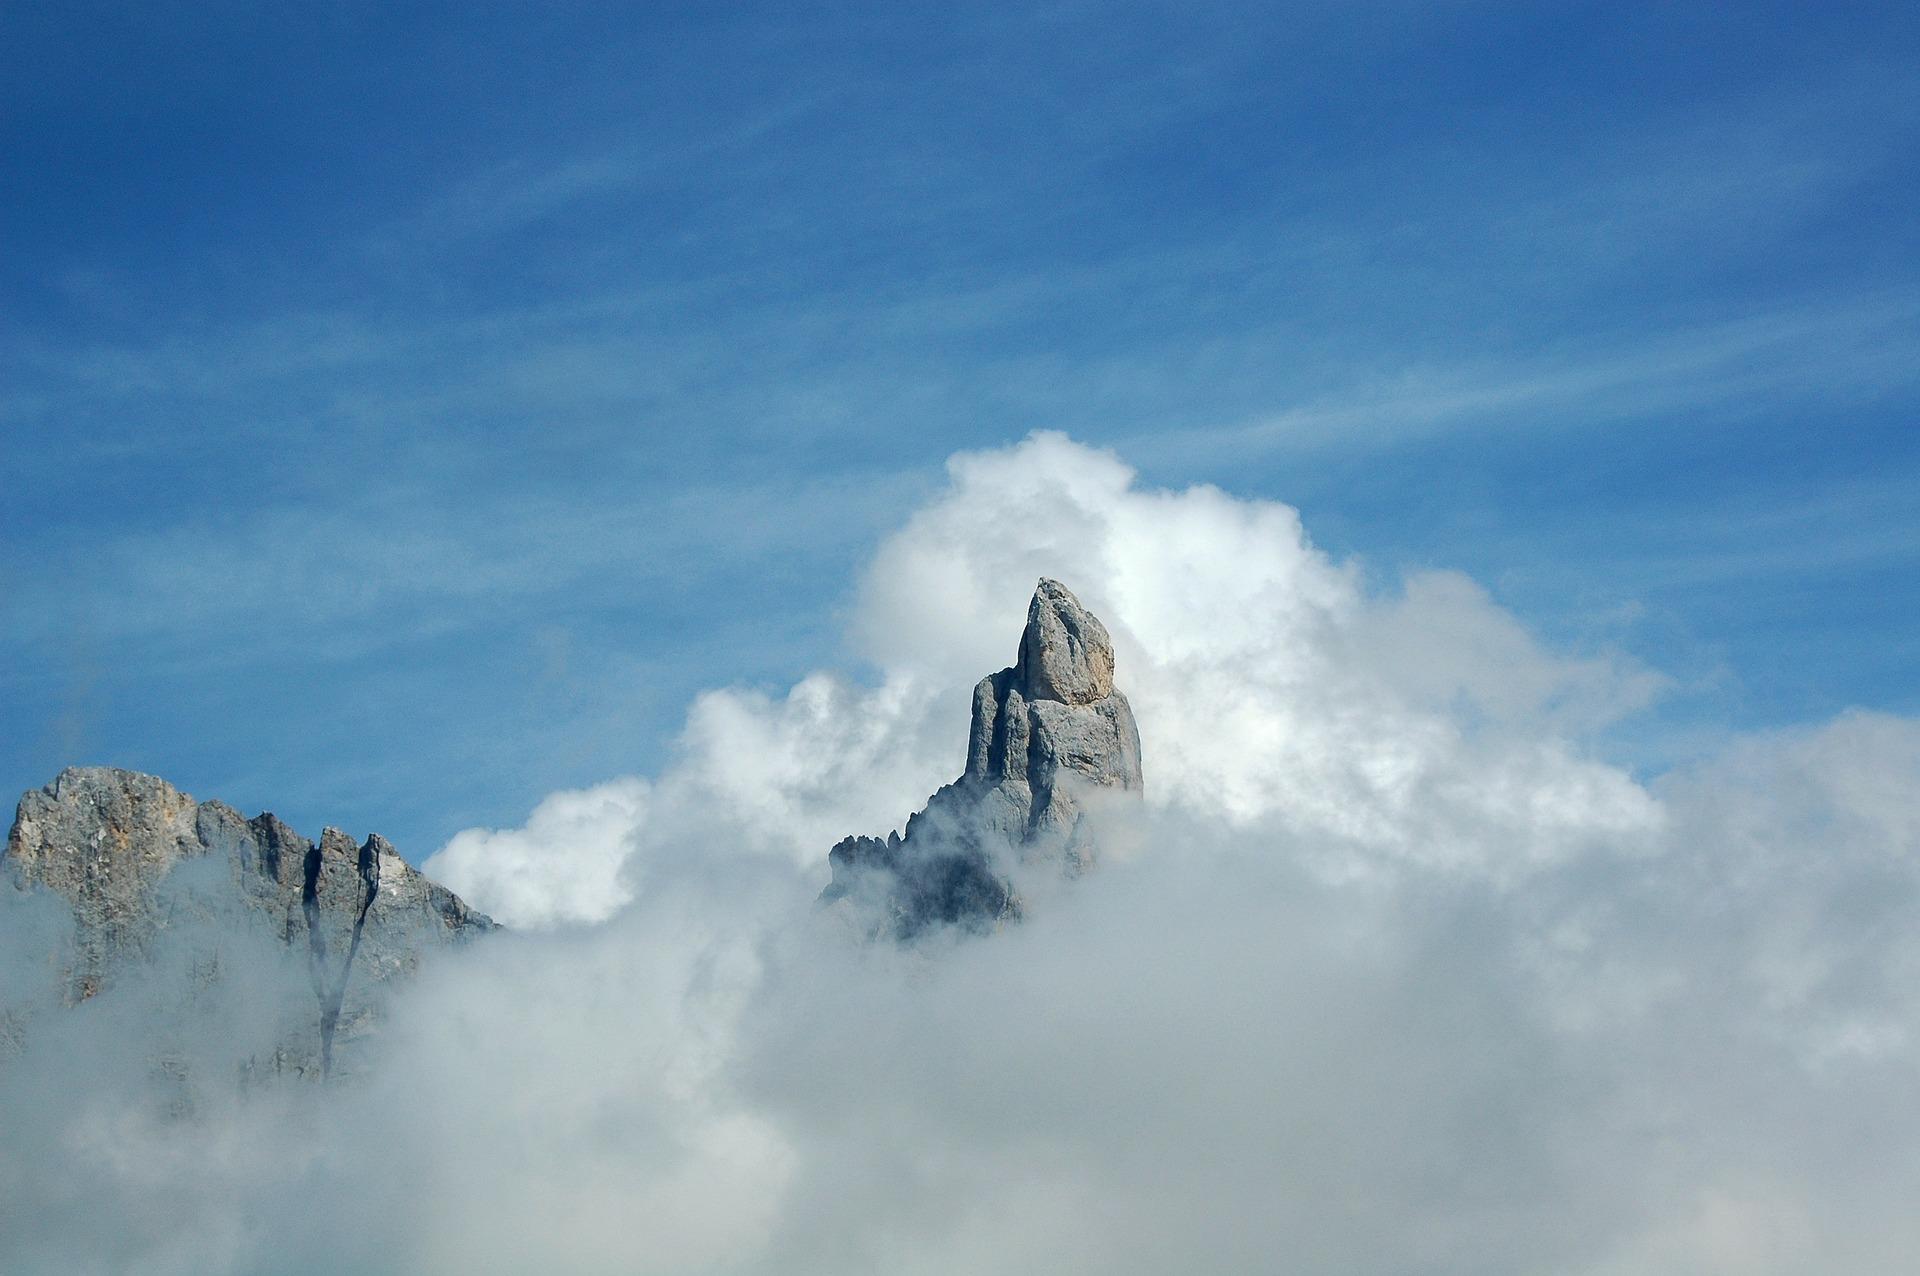 Mountains, hidden in clouds